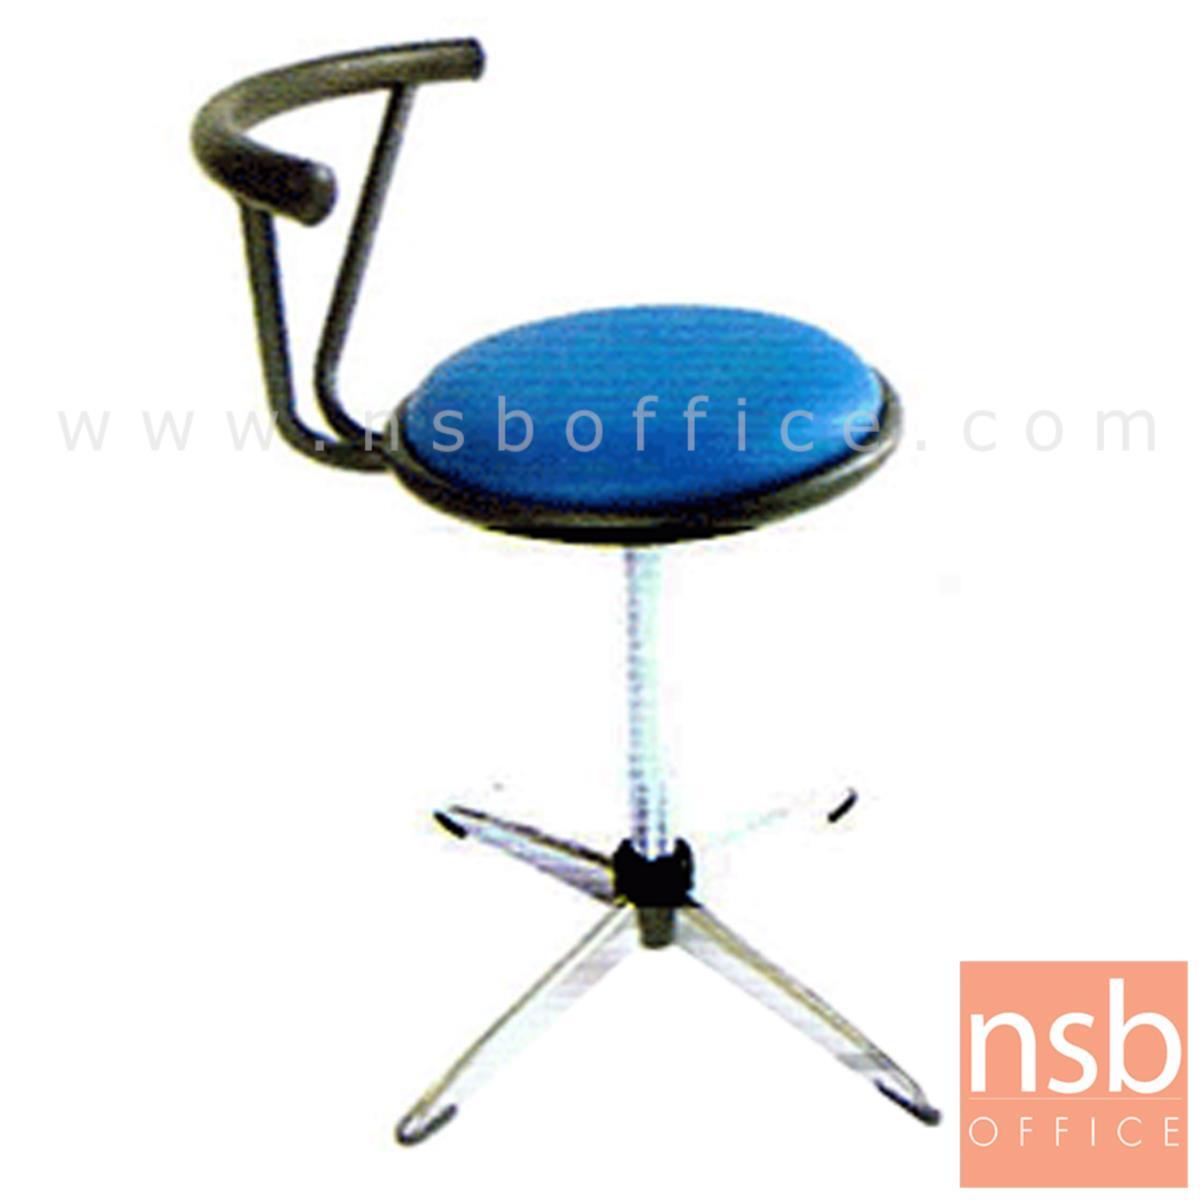 B09A008:เก้าอี้บาร์ที่นั่งกลม รุ่น CS-024 ขาเหล็ก